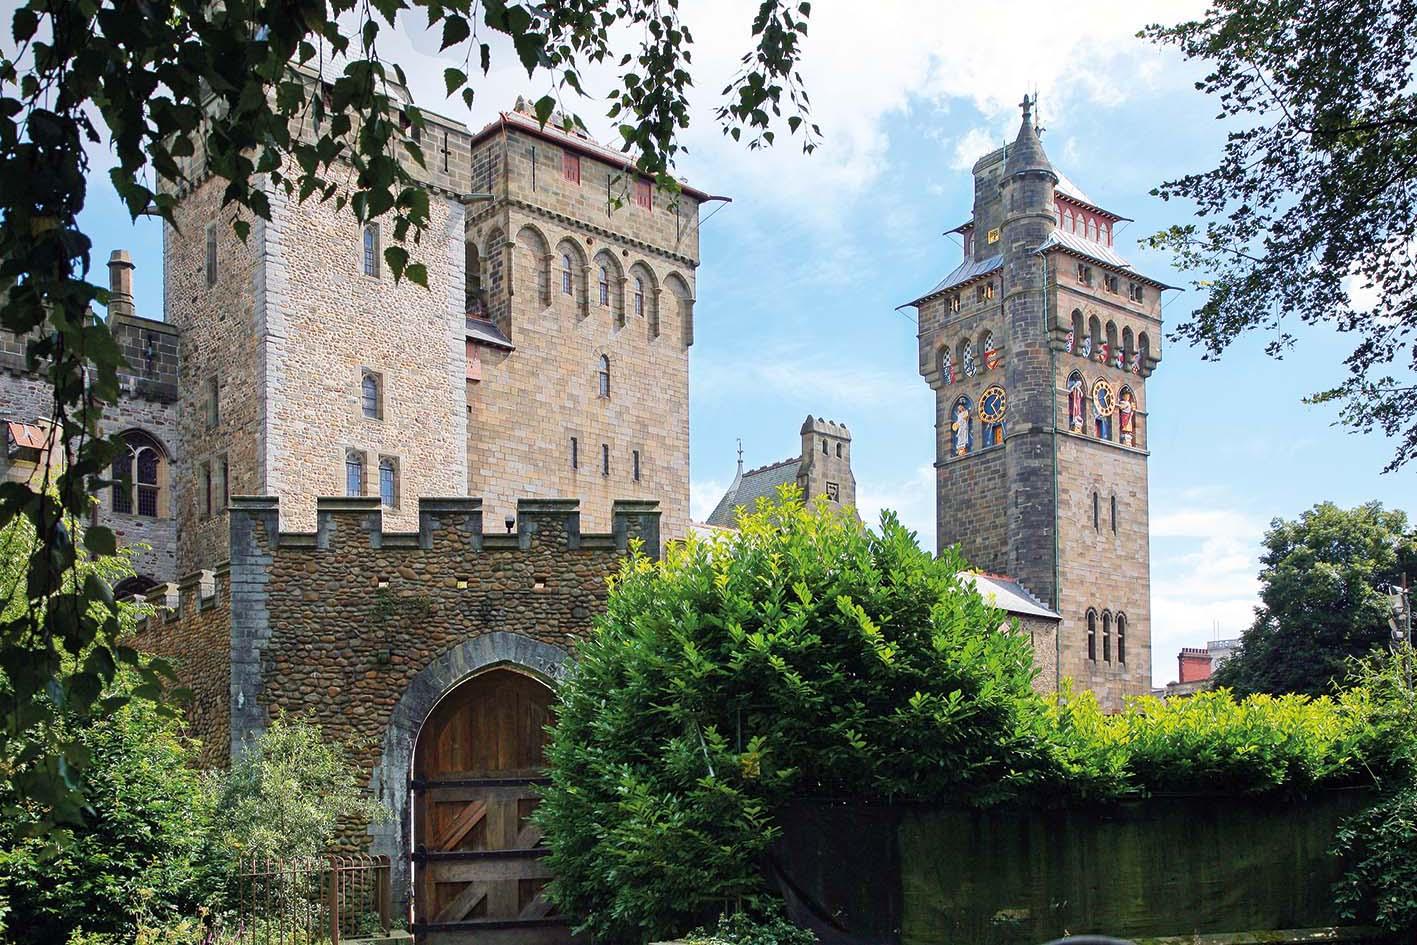 Carmarthen & Londra<br>University of Wales